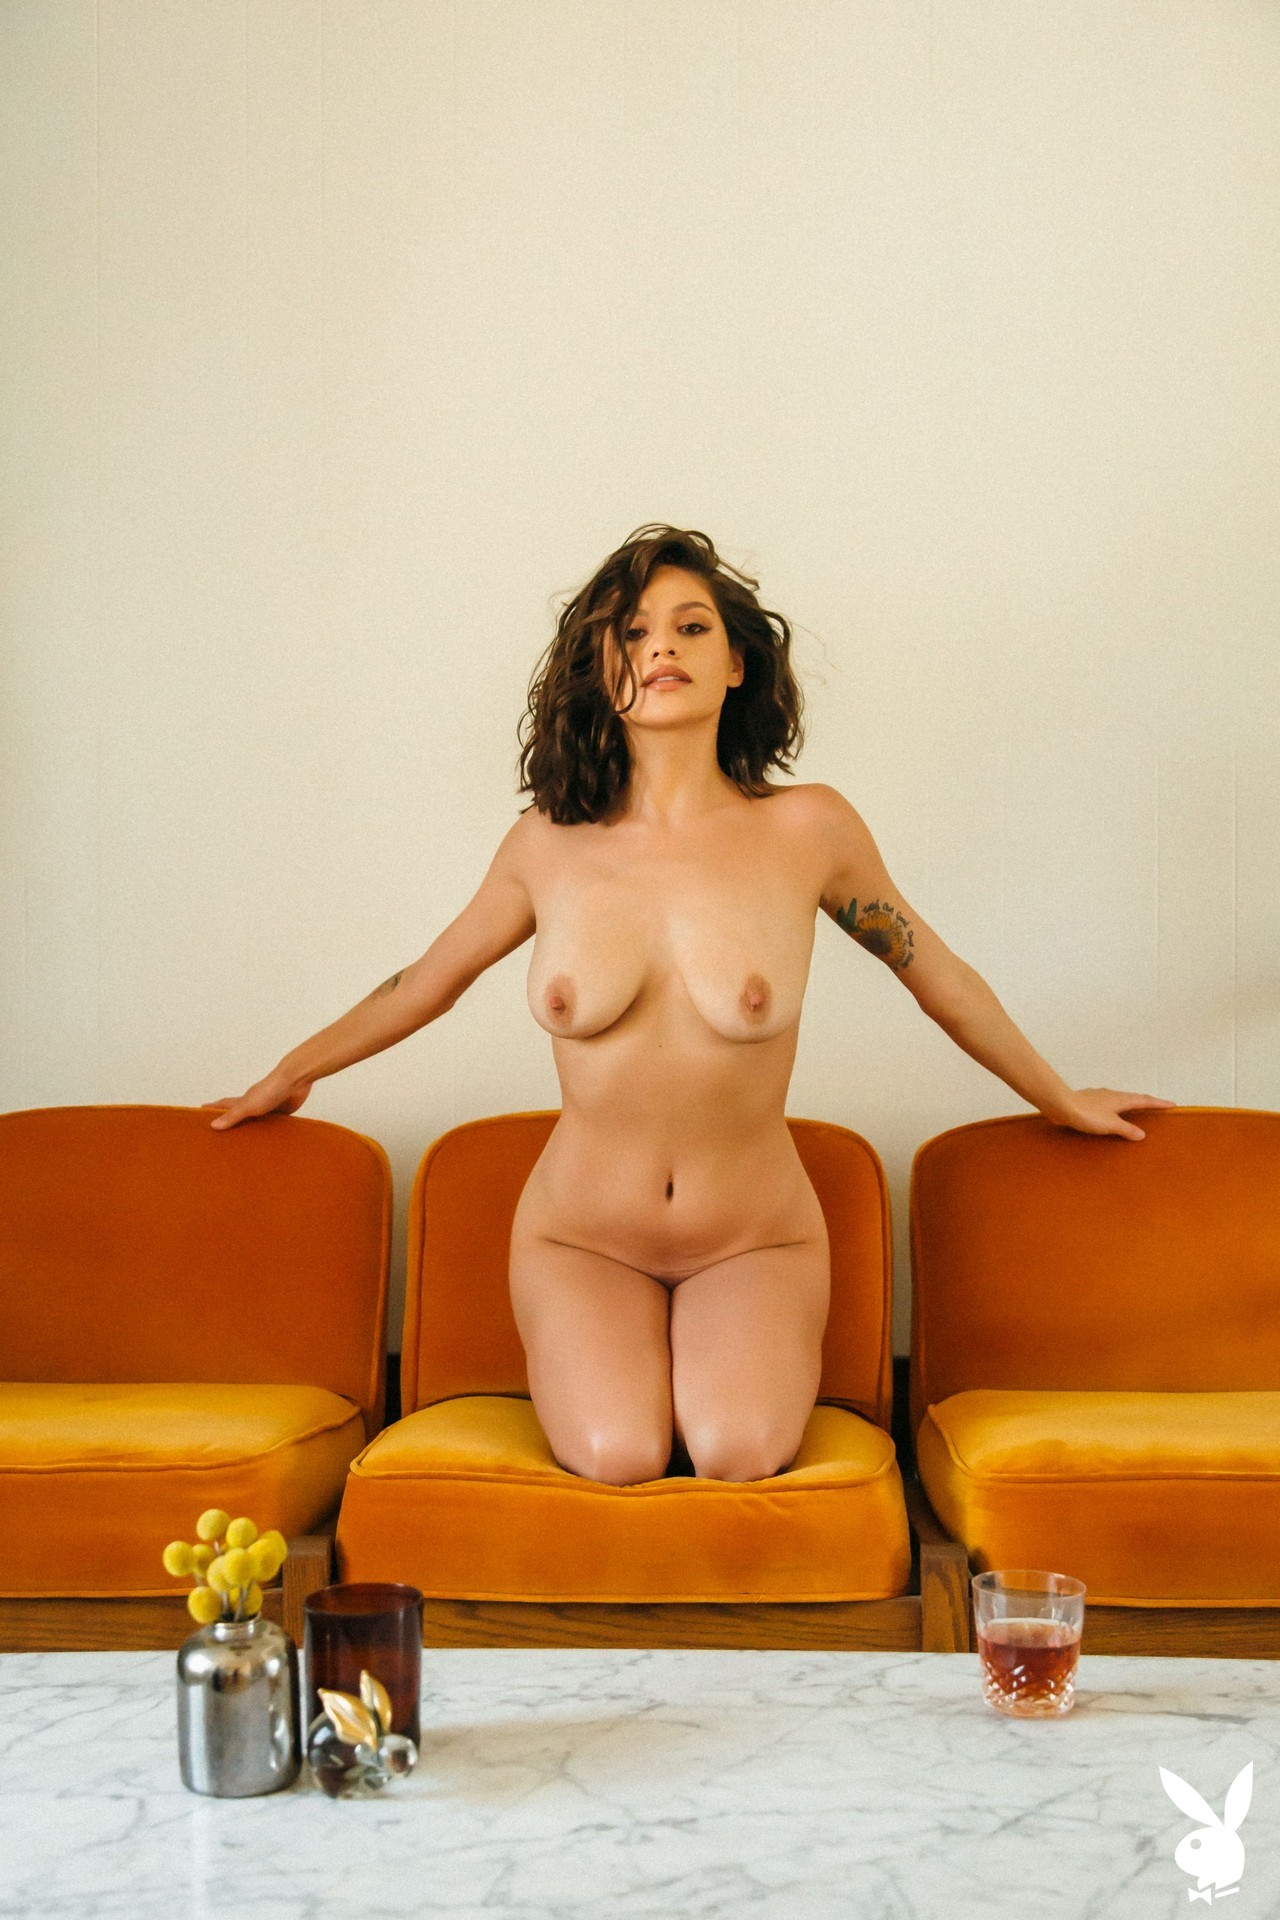 Natalie Del Real In The Simple Things Playboy Plus (19)